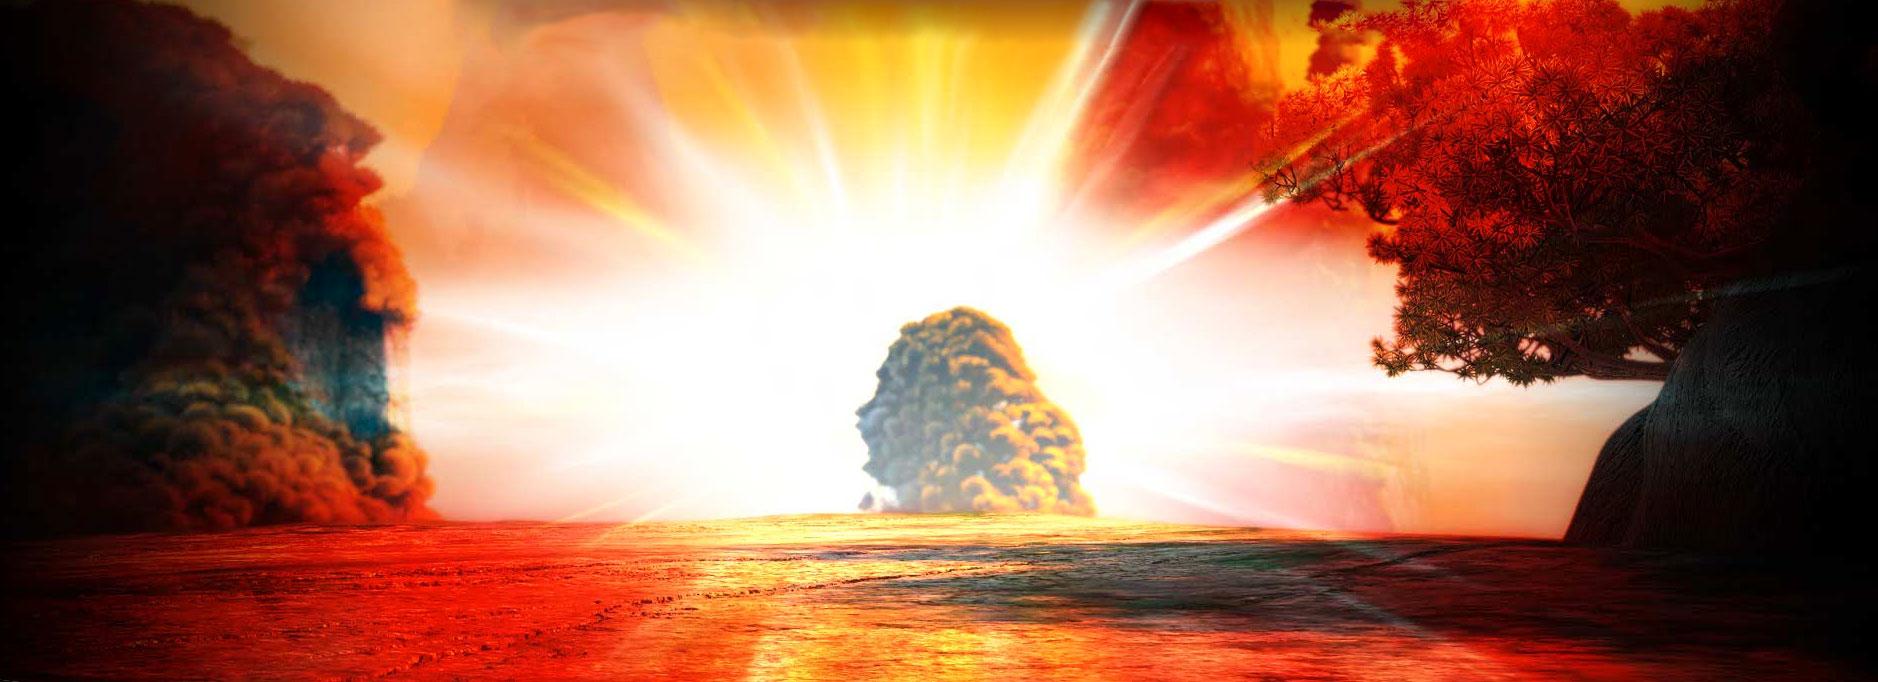 Golden Sunrise From Kung Fu Panda 2 Desktop Wallpaper